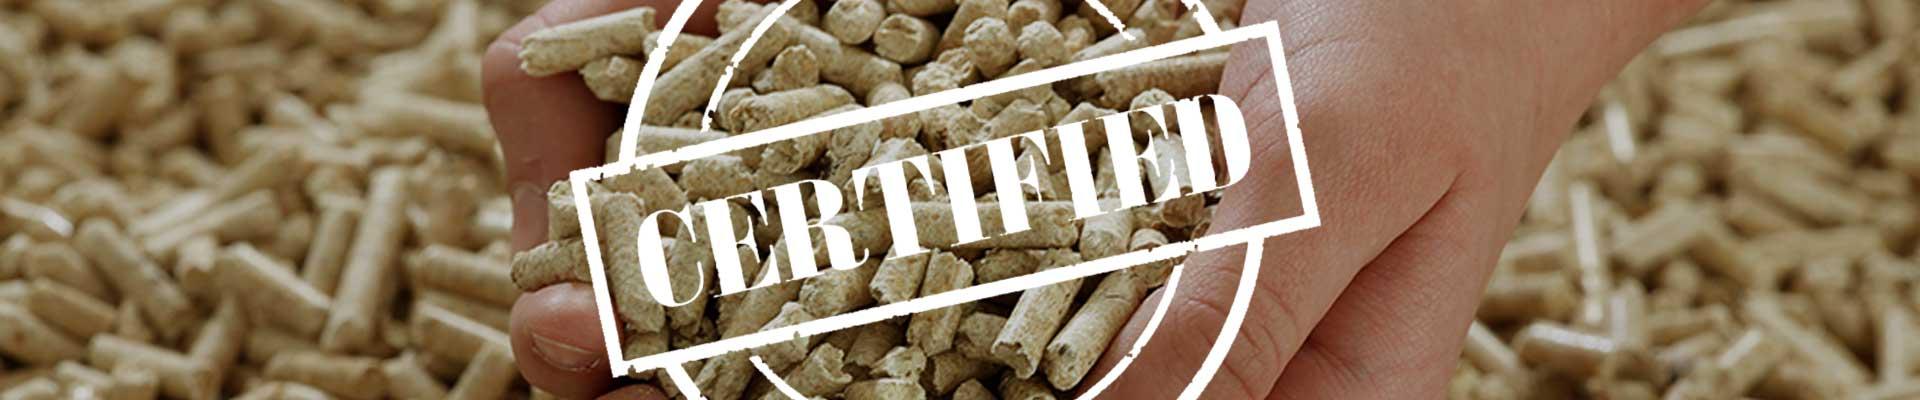 certifications-pellets-1920